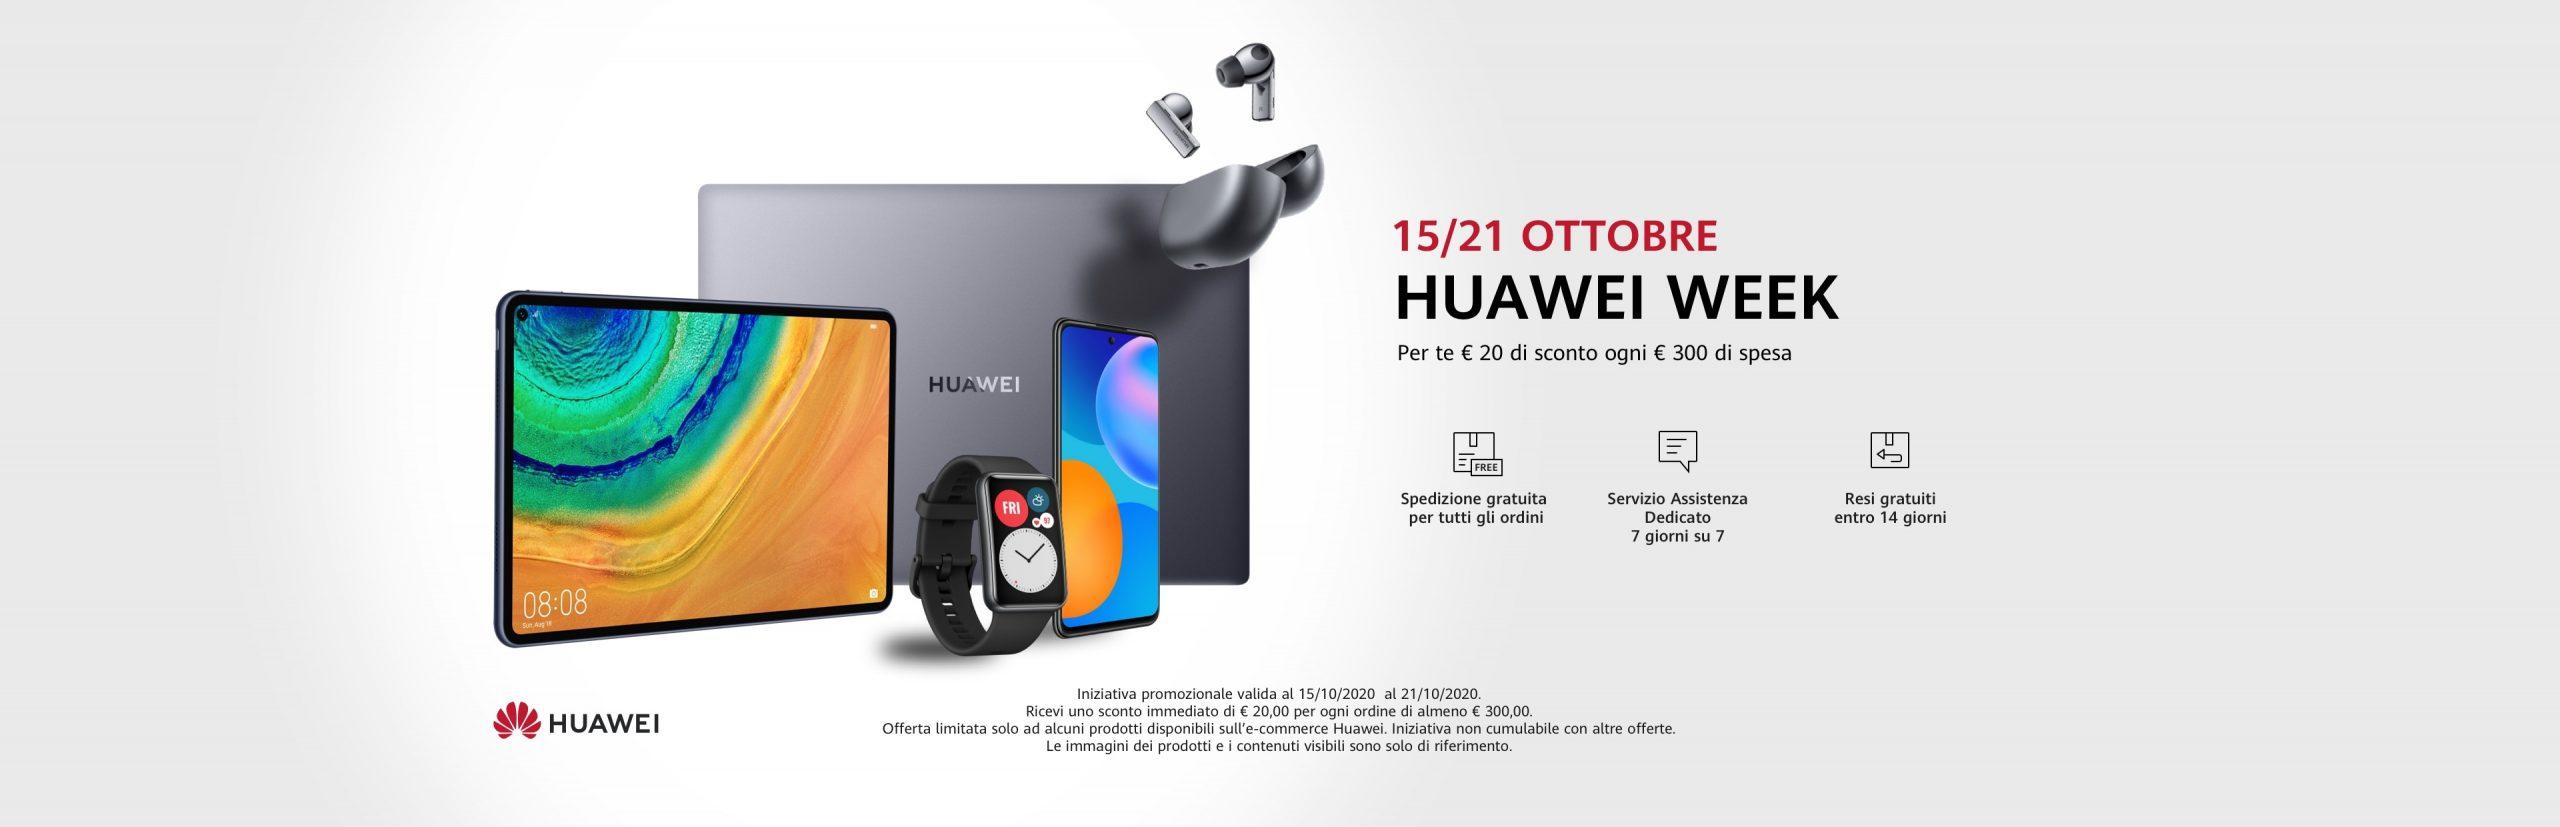 Huawei Week 15-21 ottobre 2020